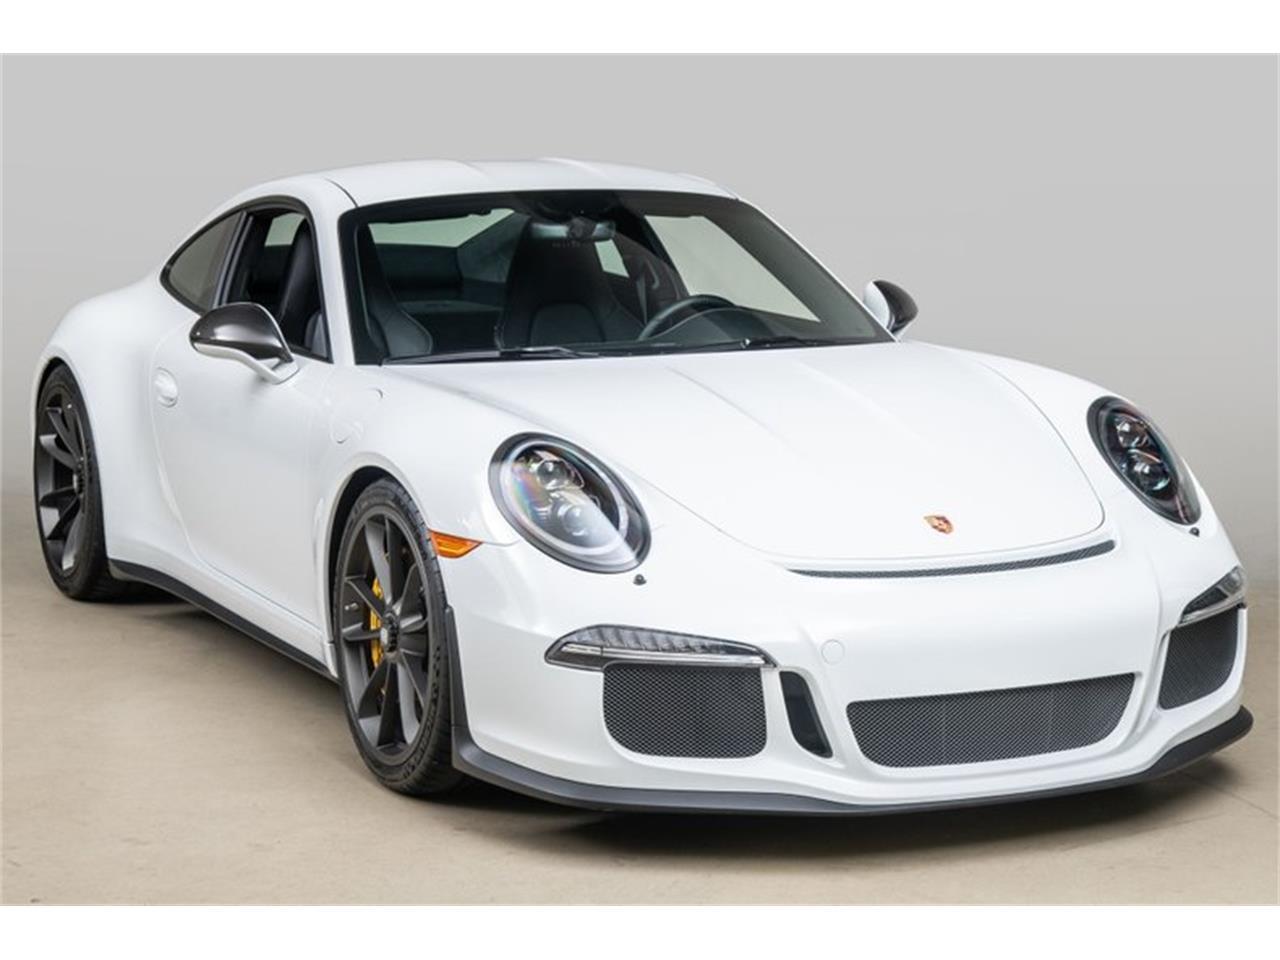 2016 Porsche 911 R (CC-1392763) for sale in Scotts Valley, California